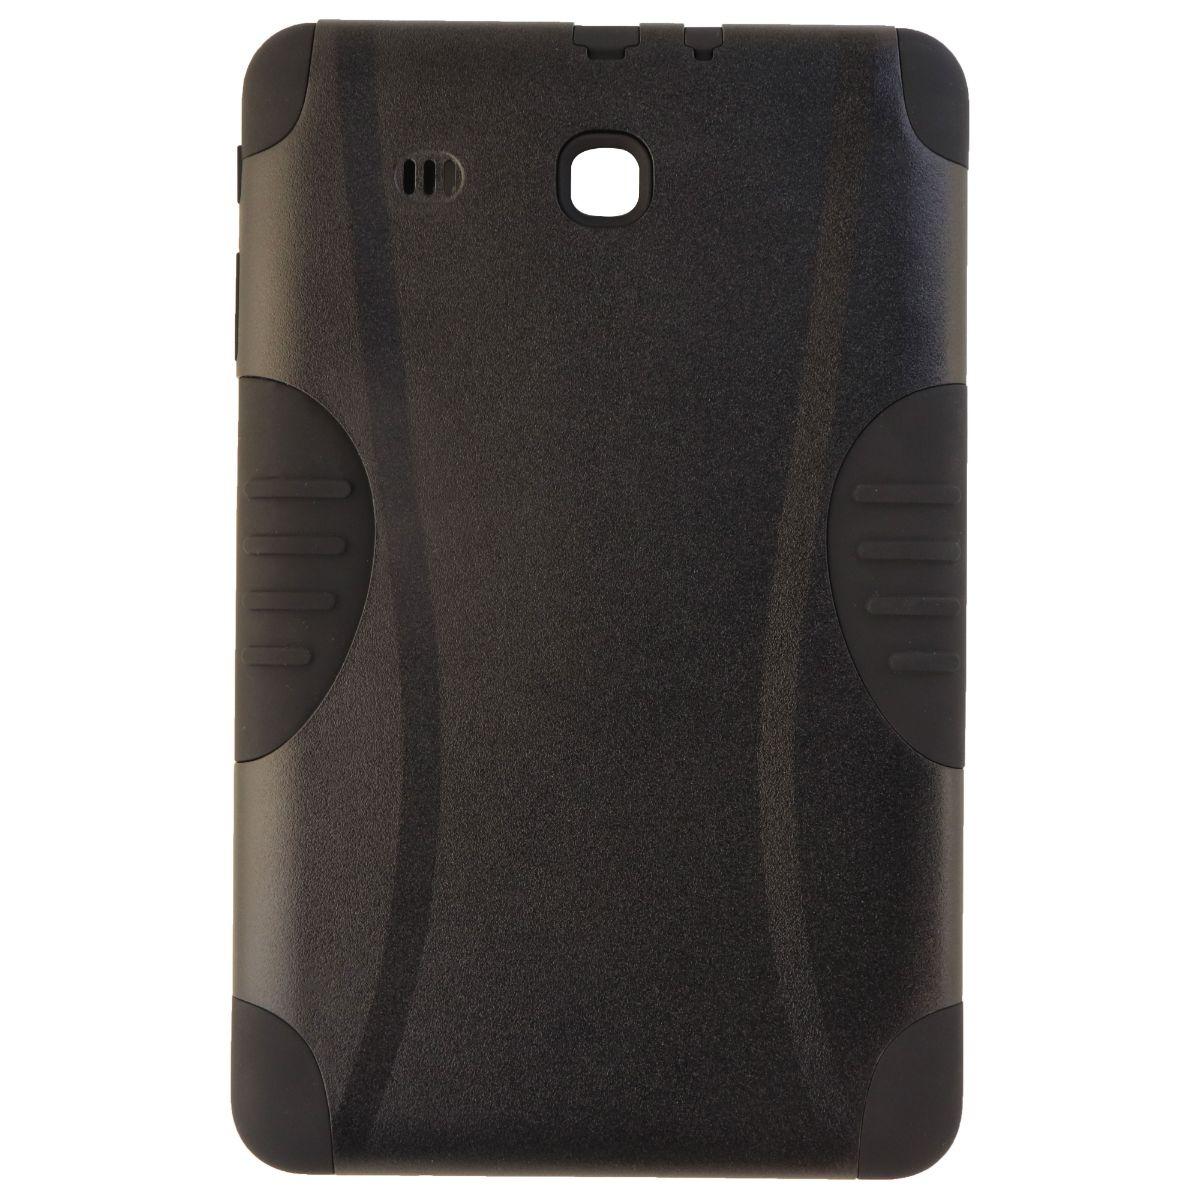 new style 04fa2 14e8a Verizon Rugged Cover Dual Layer Case for Galaxy Tab E (9.6) Tablets ...